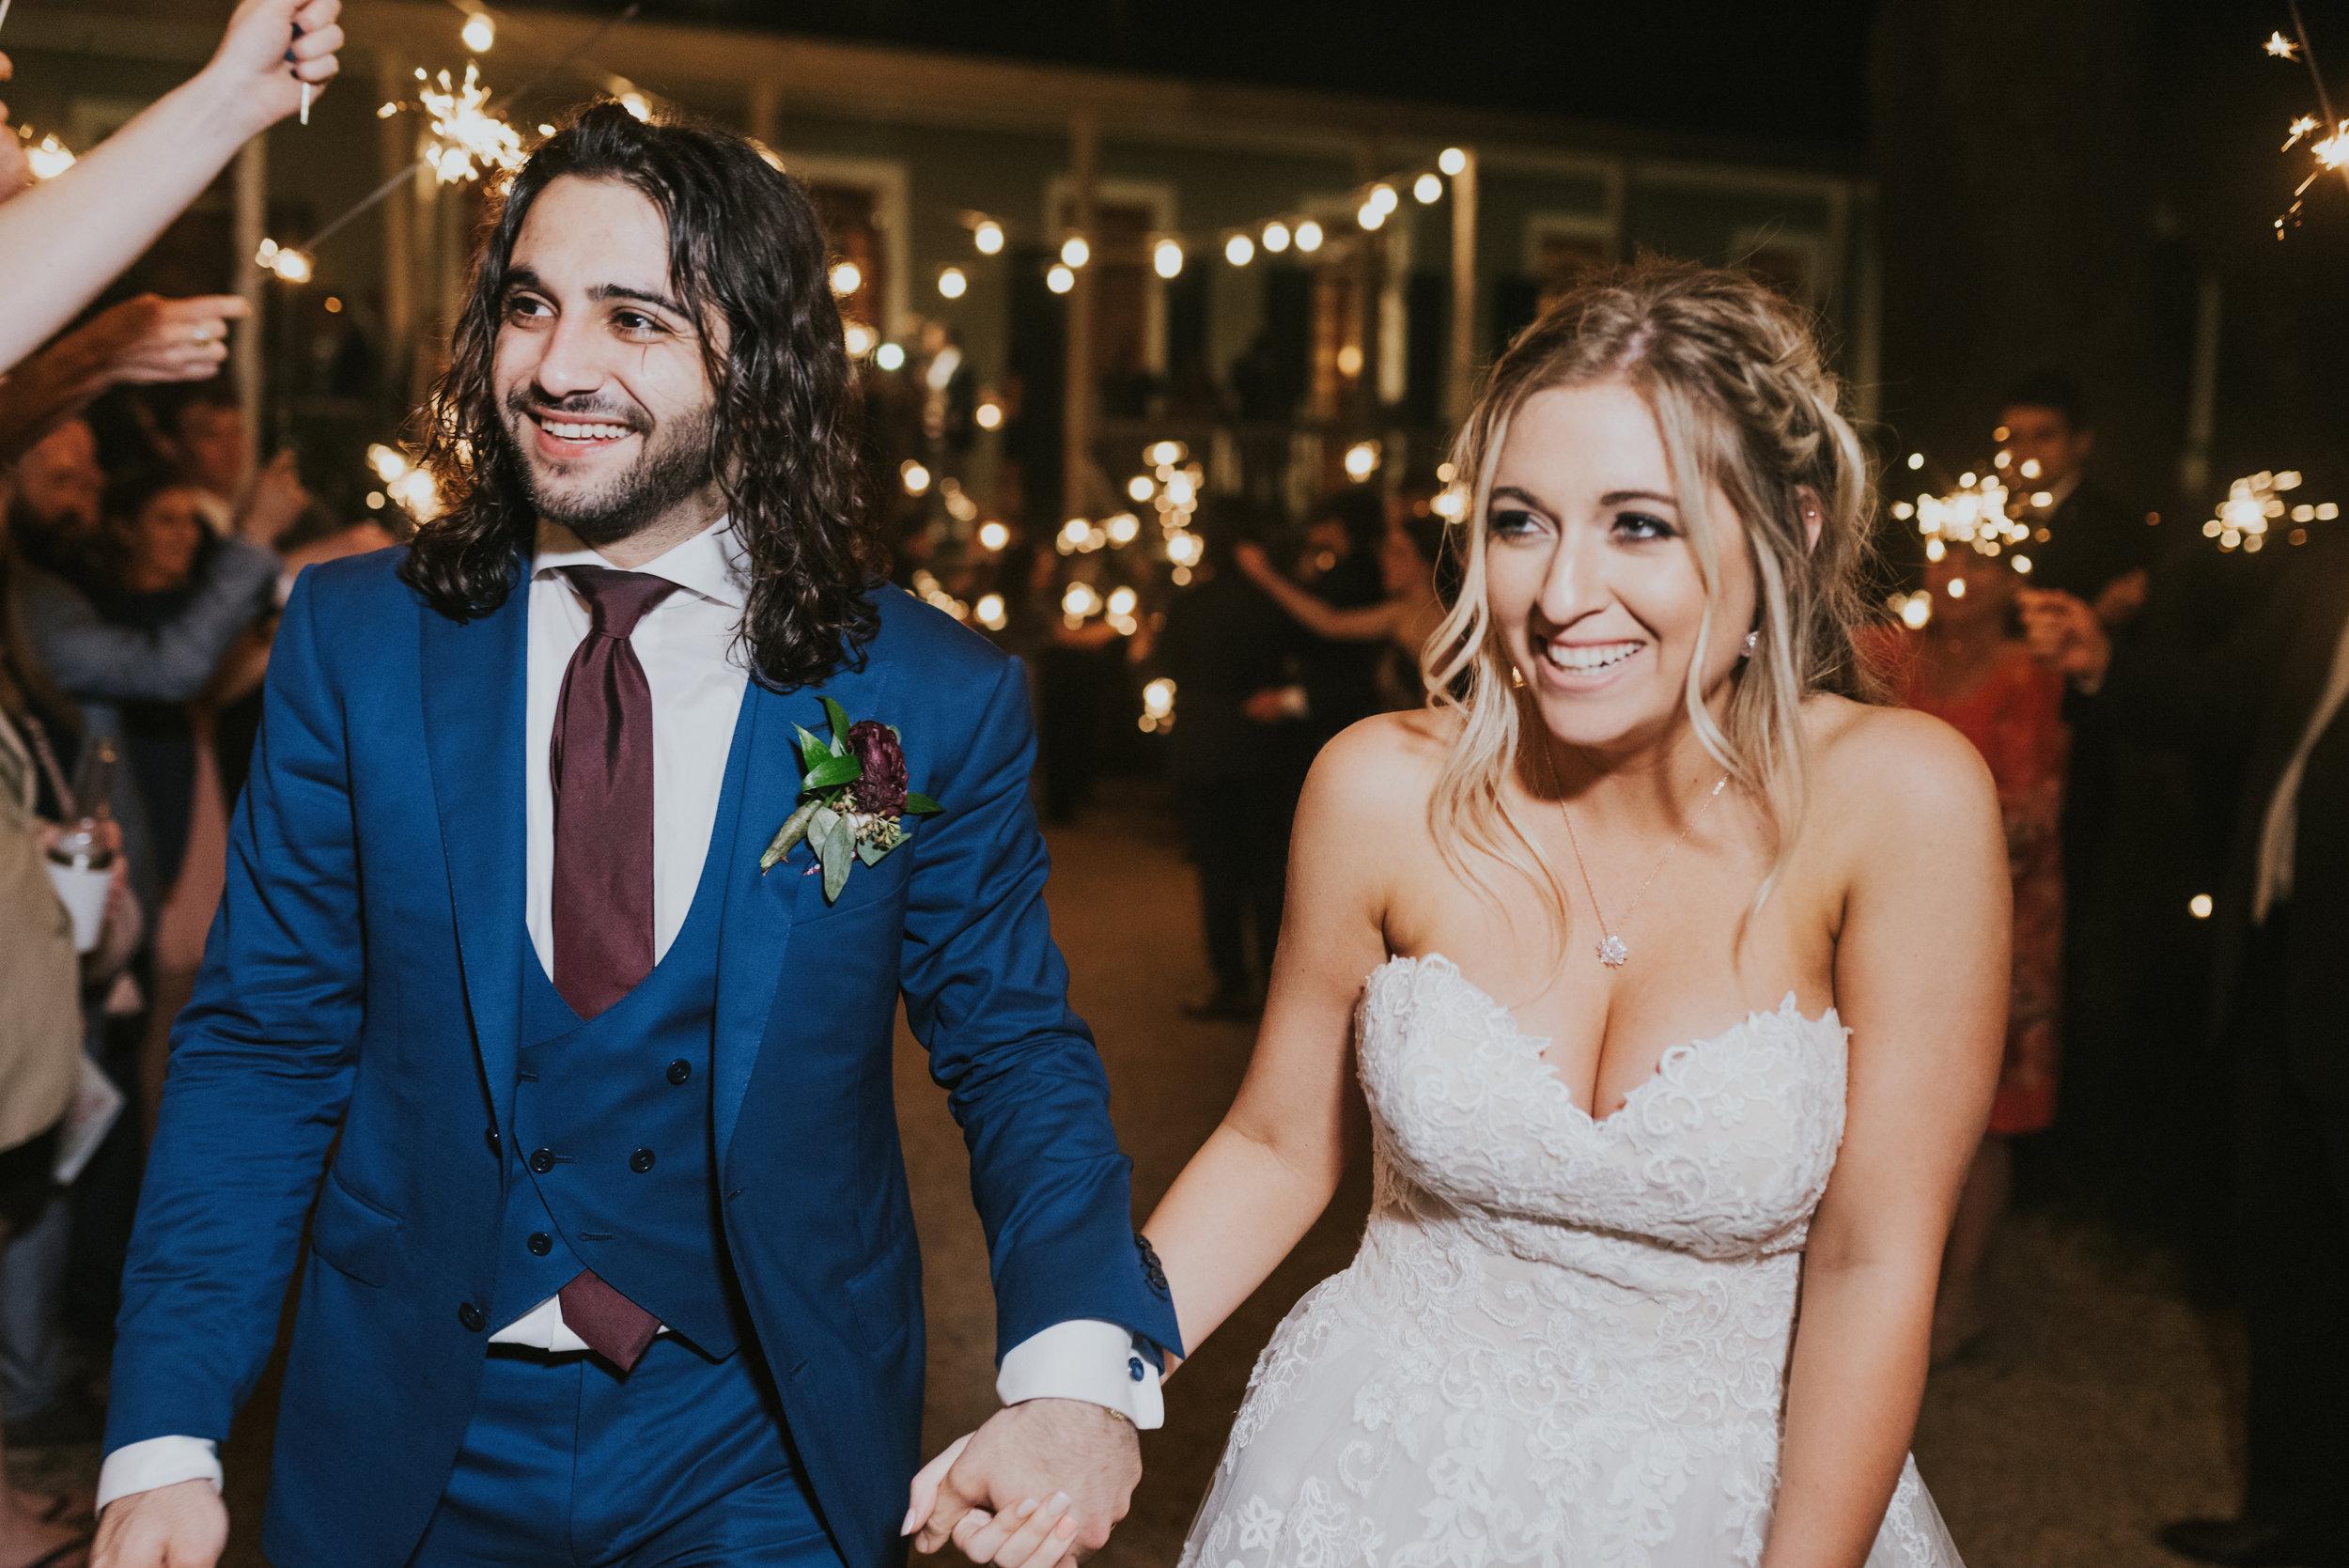 Southern Fete, Southern Wedding, Bride and Groom Sparkler Exit, Rip Van Winkle Gardens, Jen Menard Photo